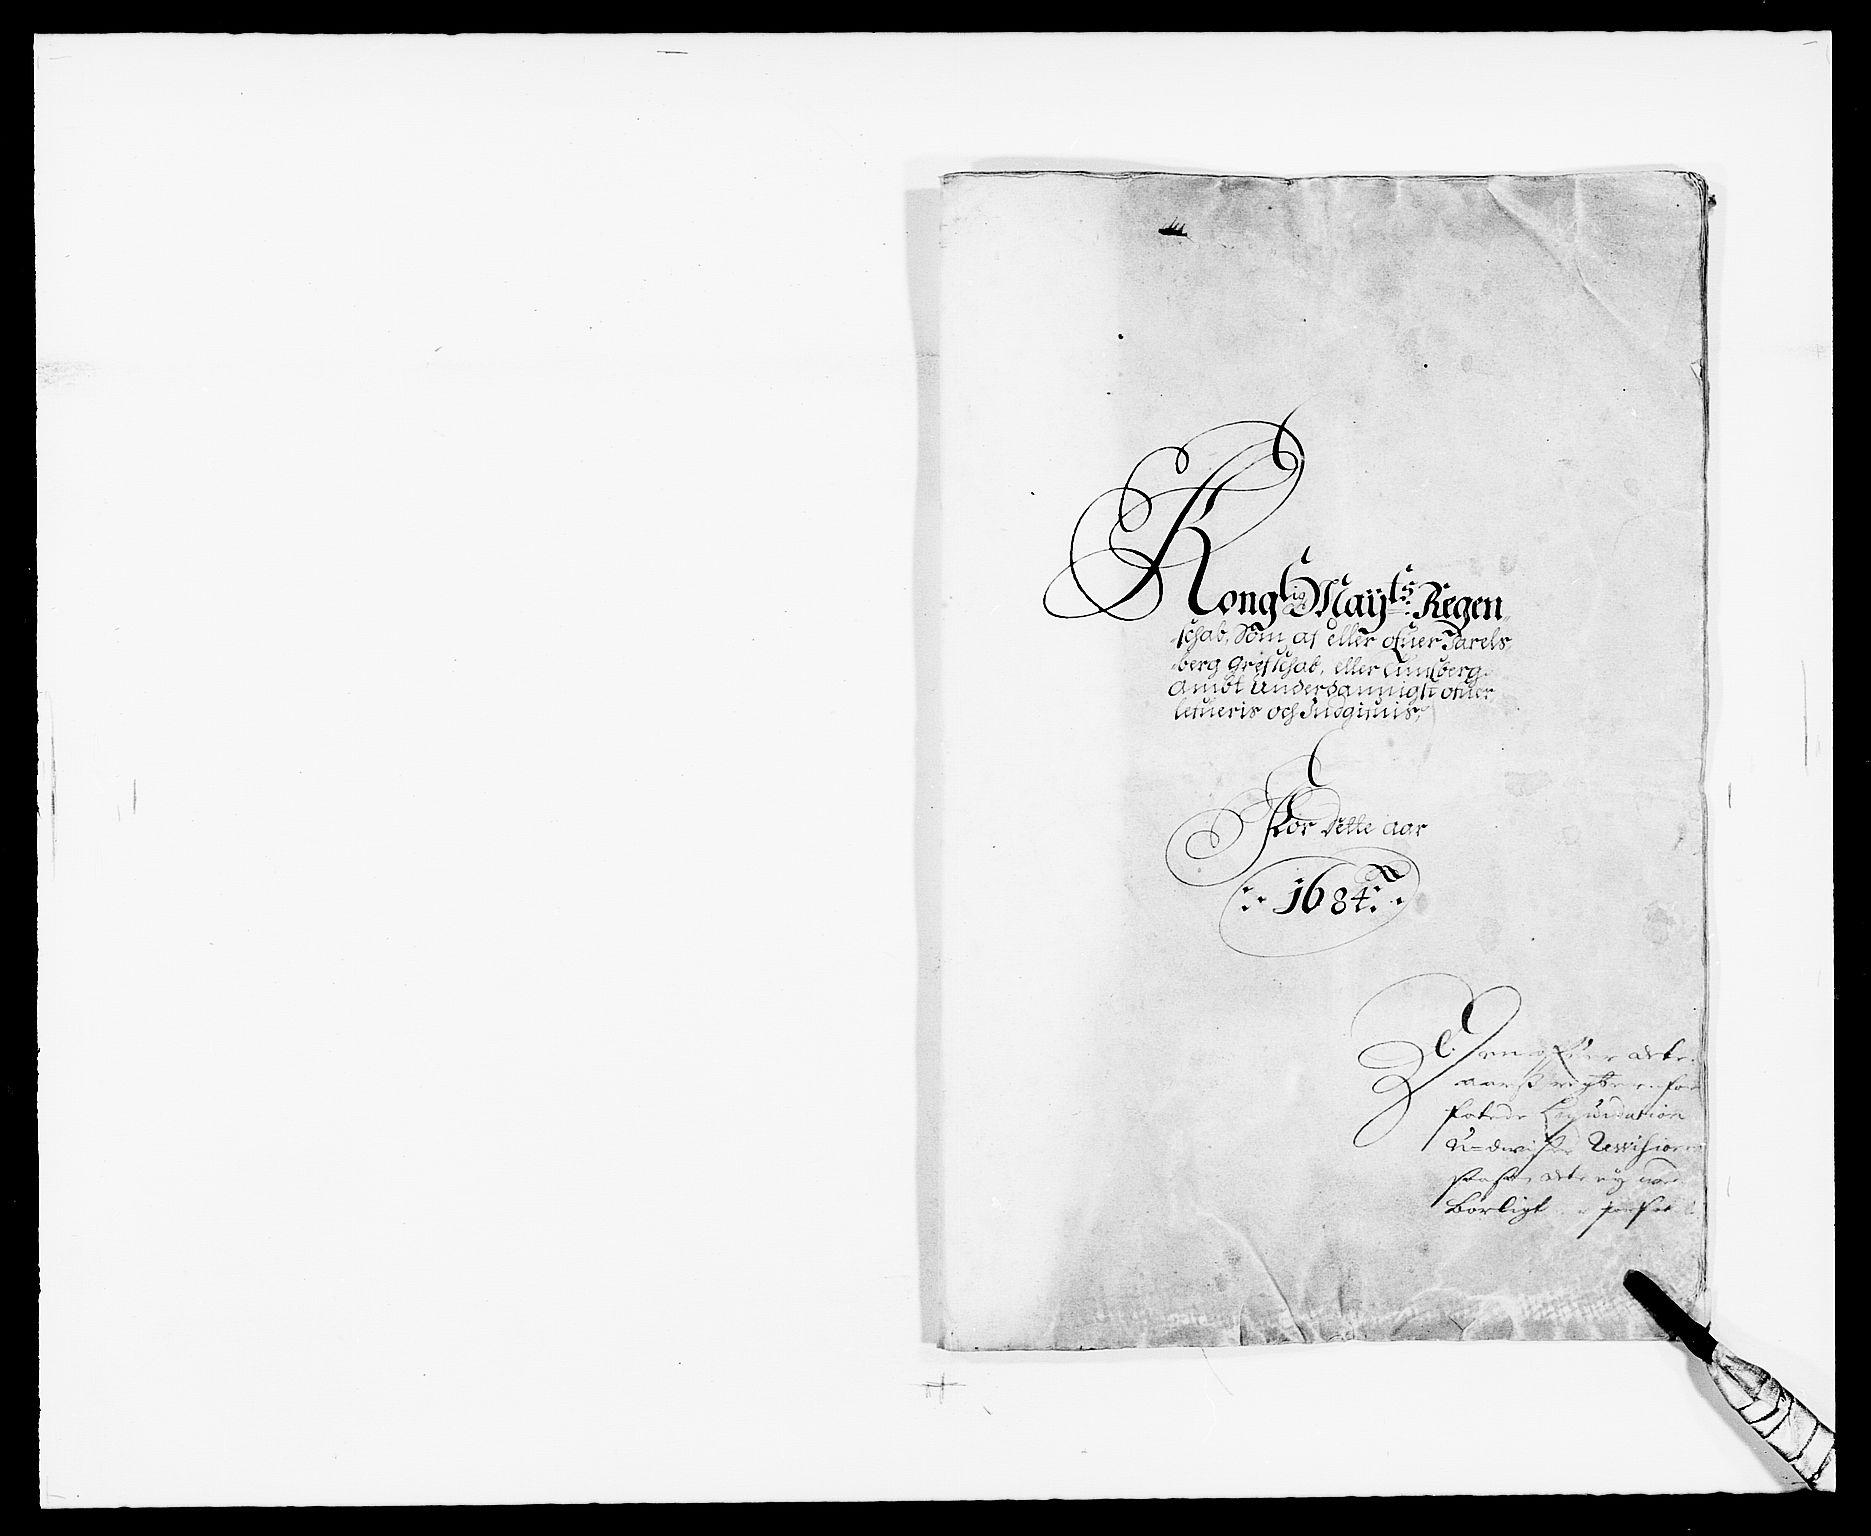 RA, Rentekammeret inntil 1814, Reviderte regnskaper, Fogderegnskap, R32/L1854: Fogderegnskap Jarlsberg grevskap, 1684, s. 1